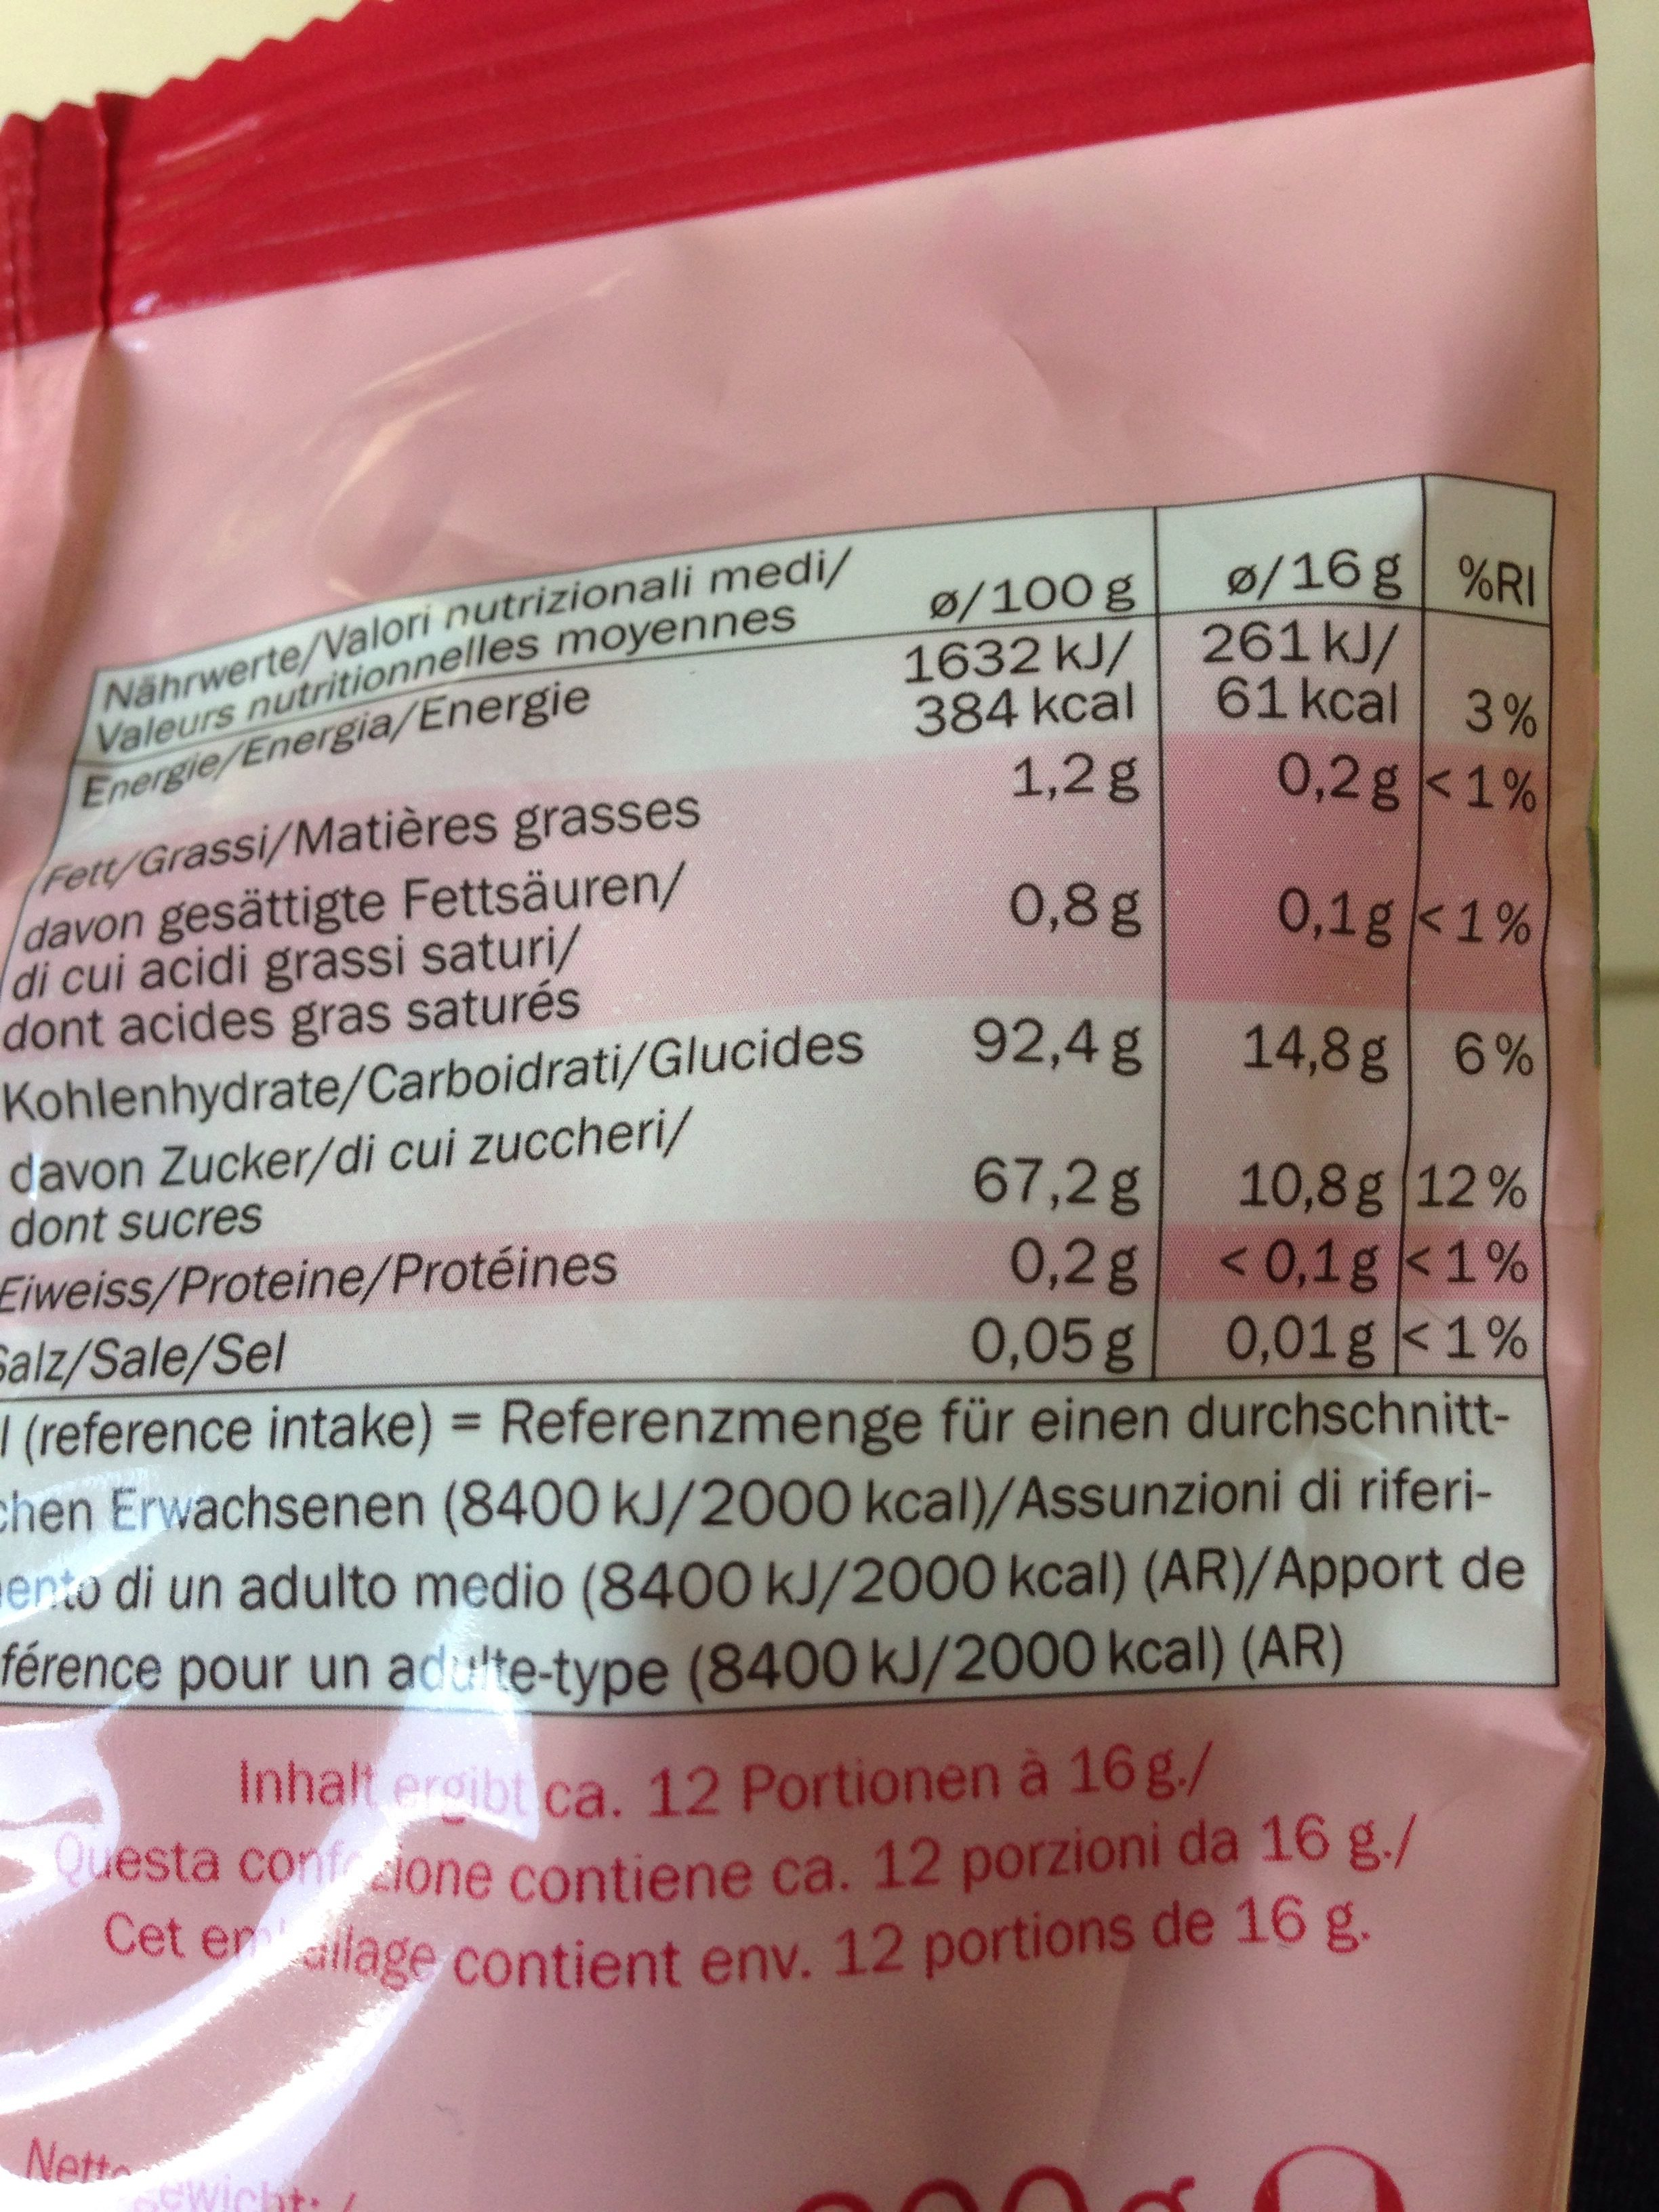 Bonbons Creme Framboise - Ingredients